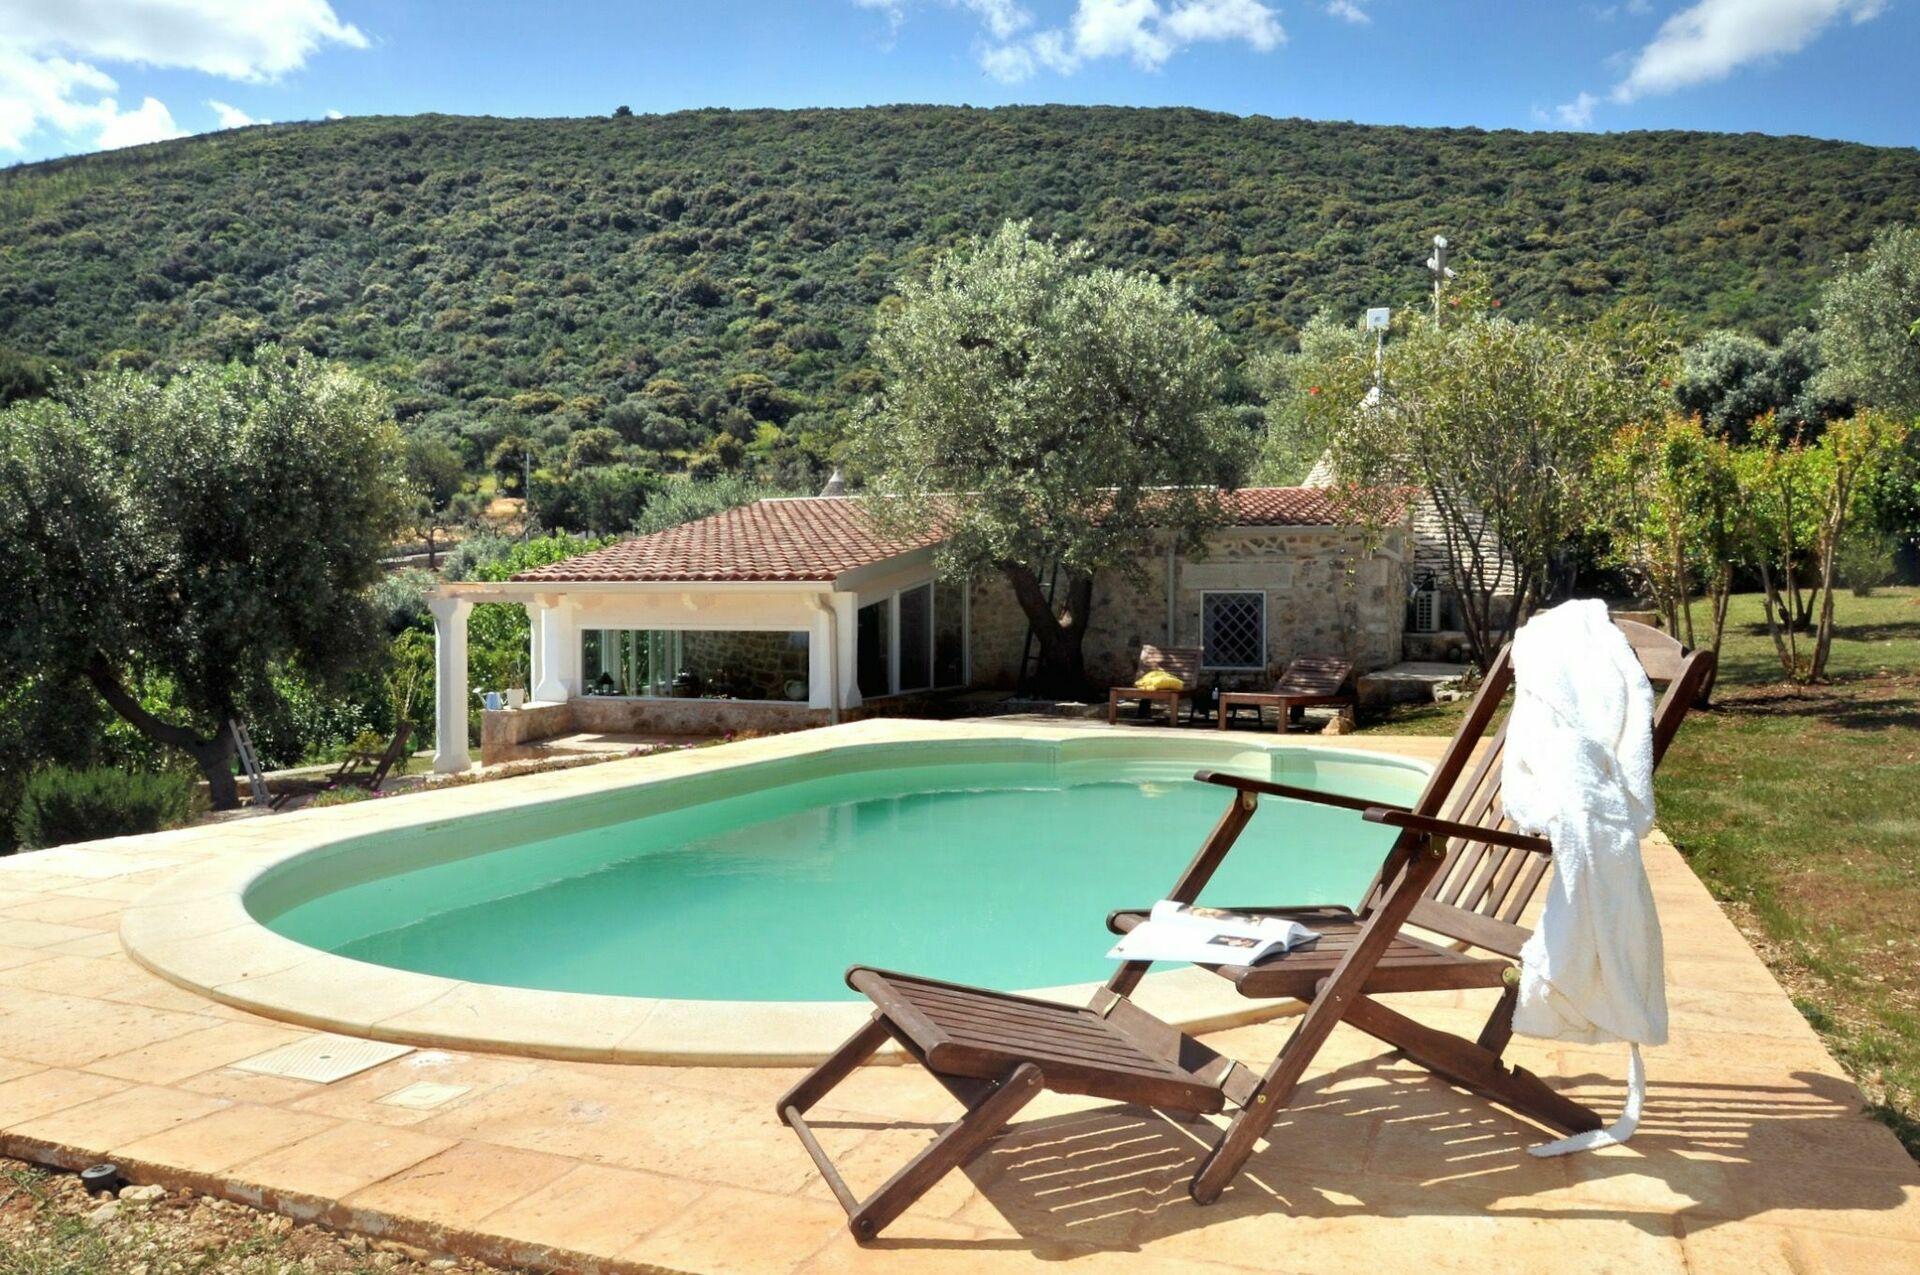 yout holiday vacation rentals - HD1920×1275